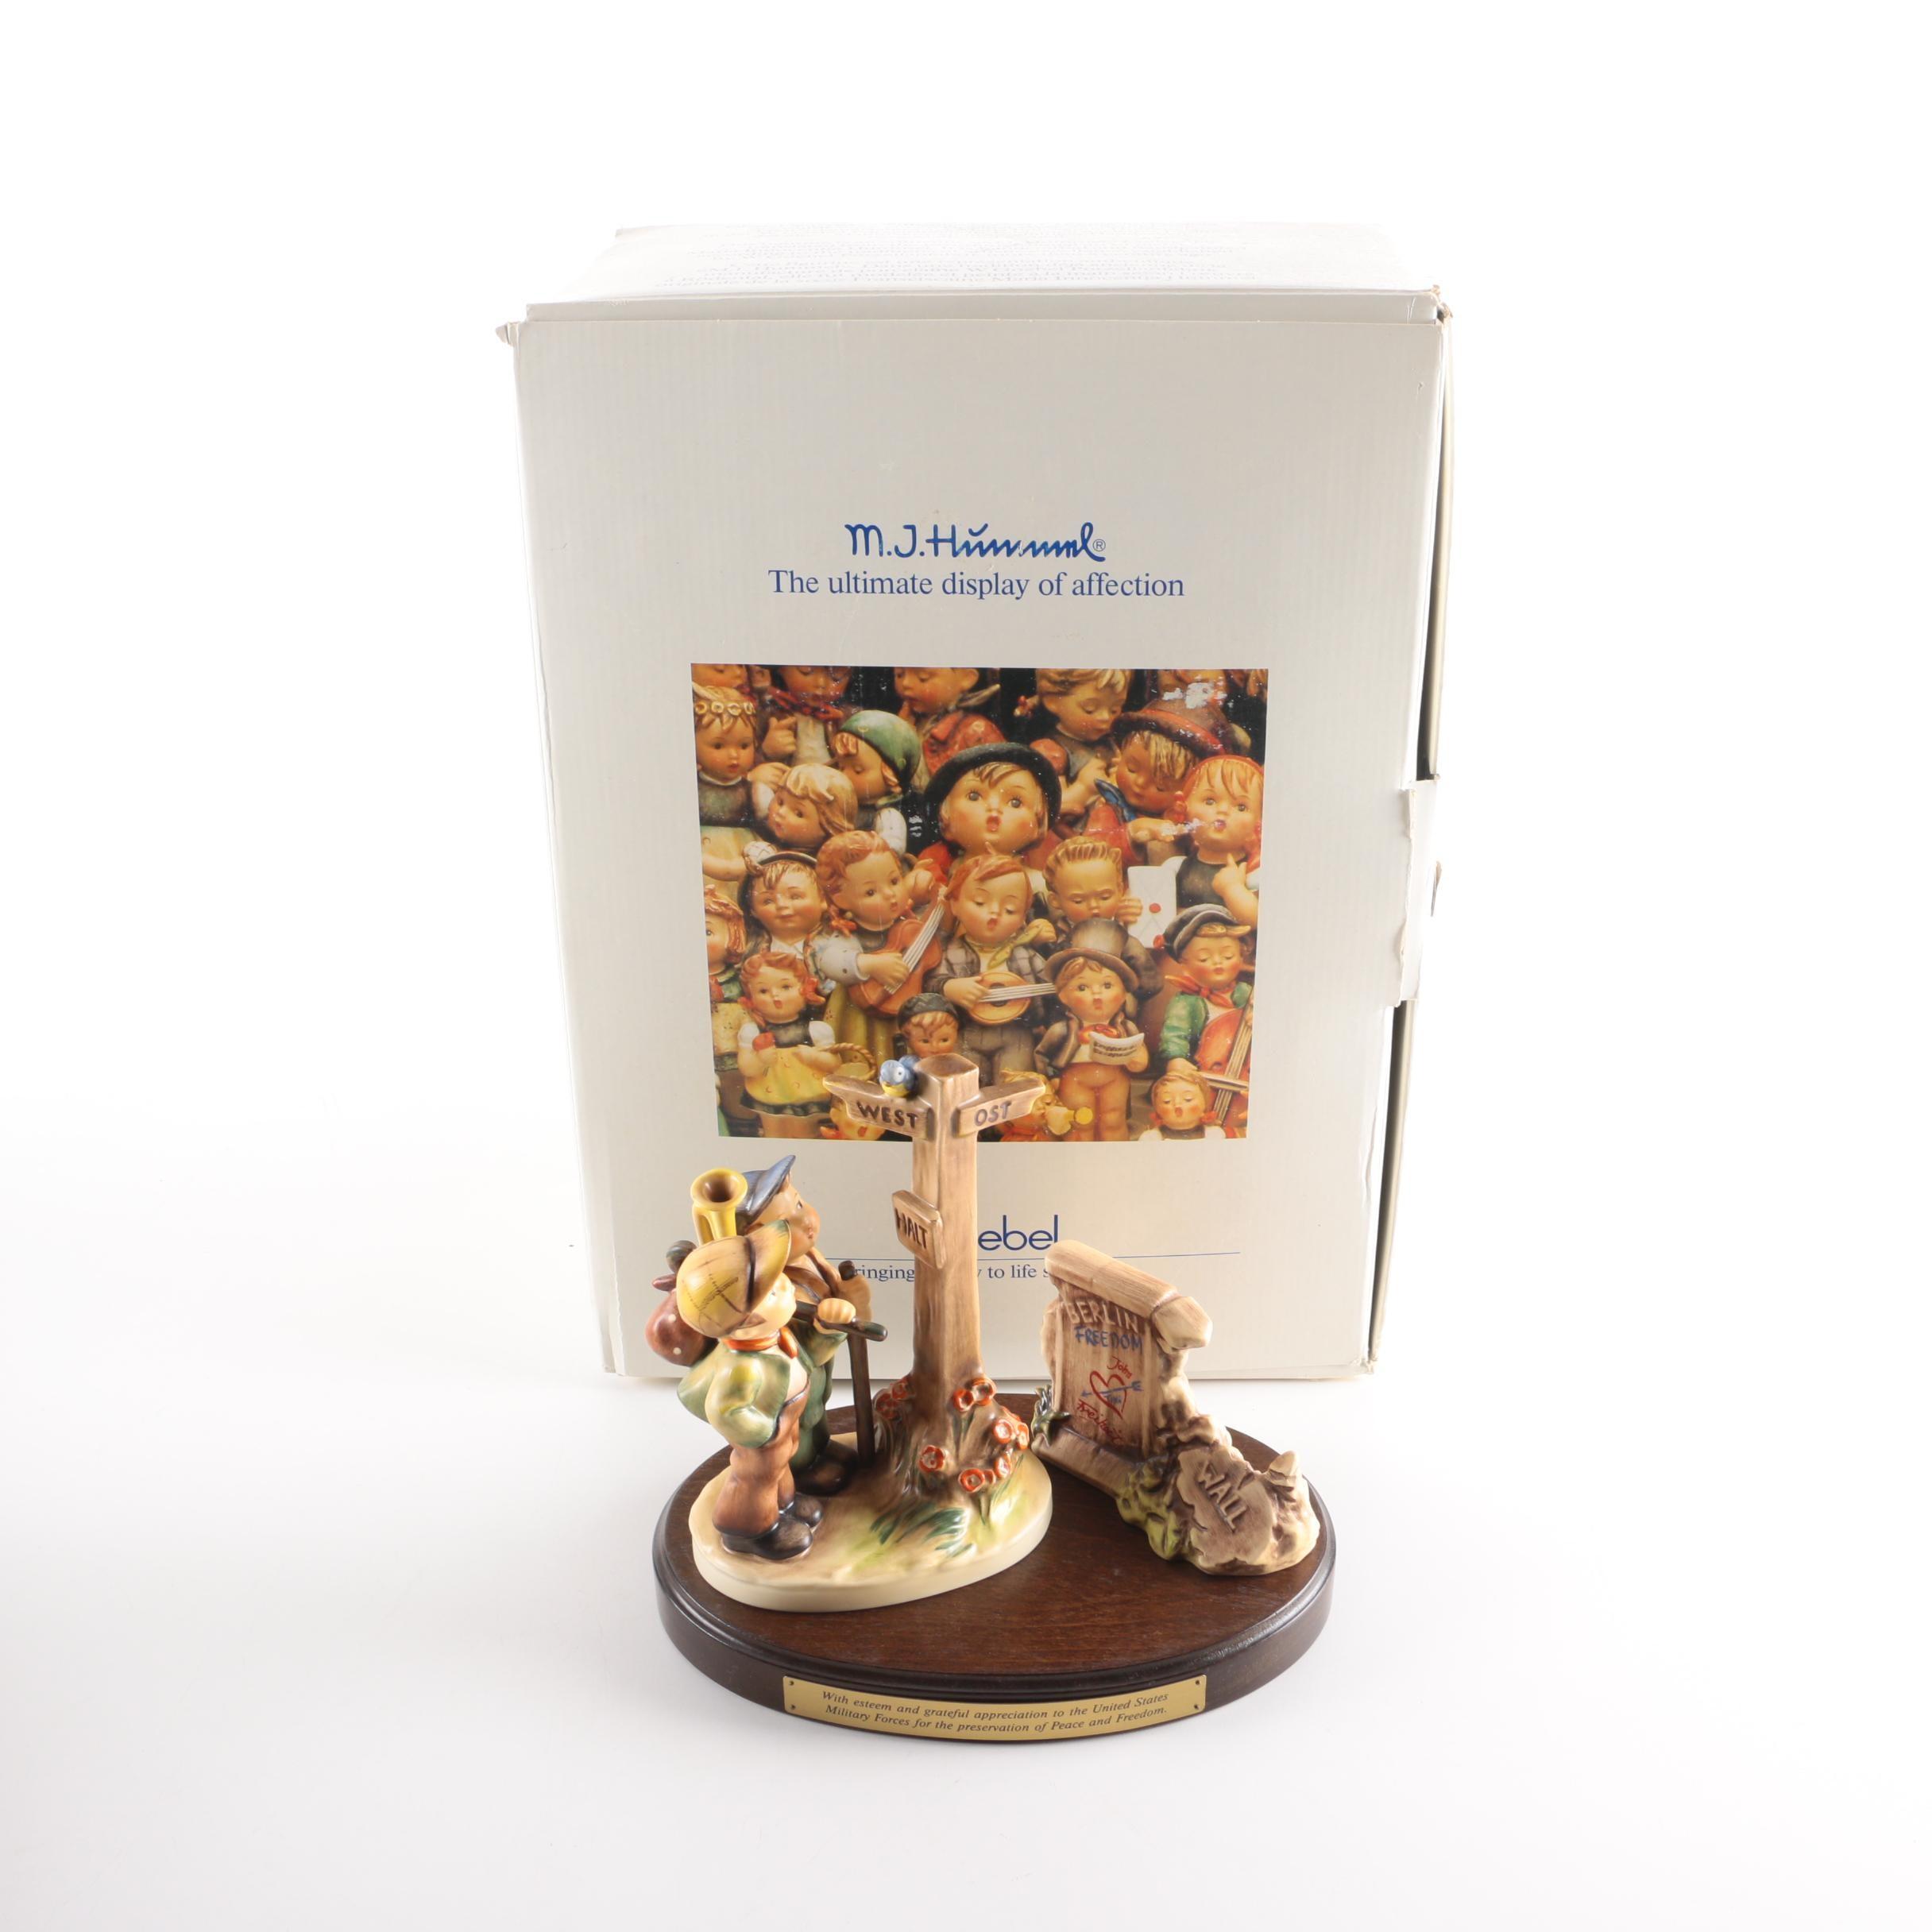 Limited Edition Berlin Wall Hummel Figurine